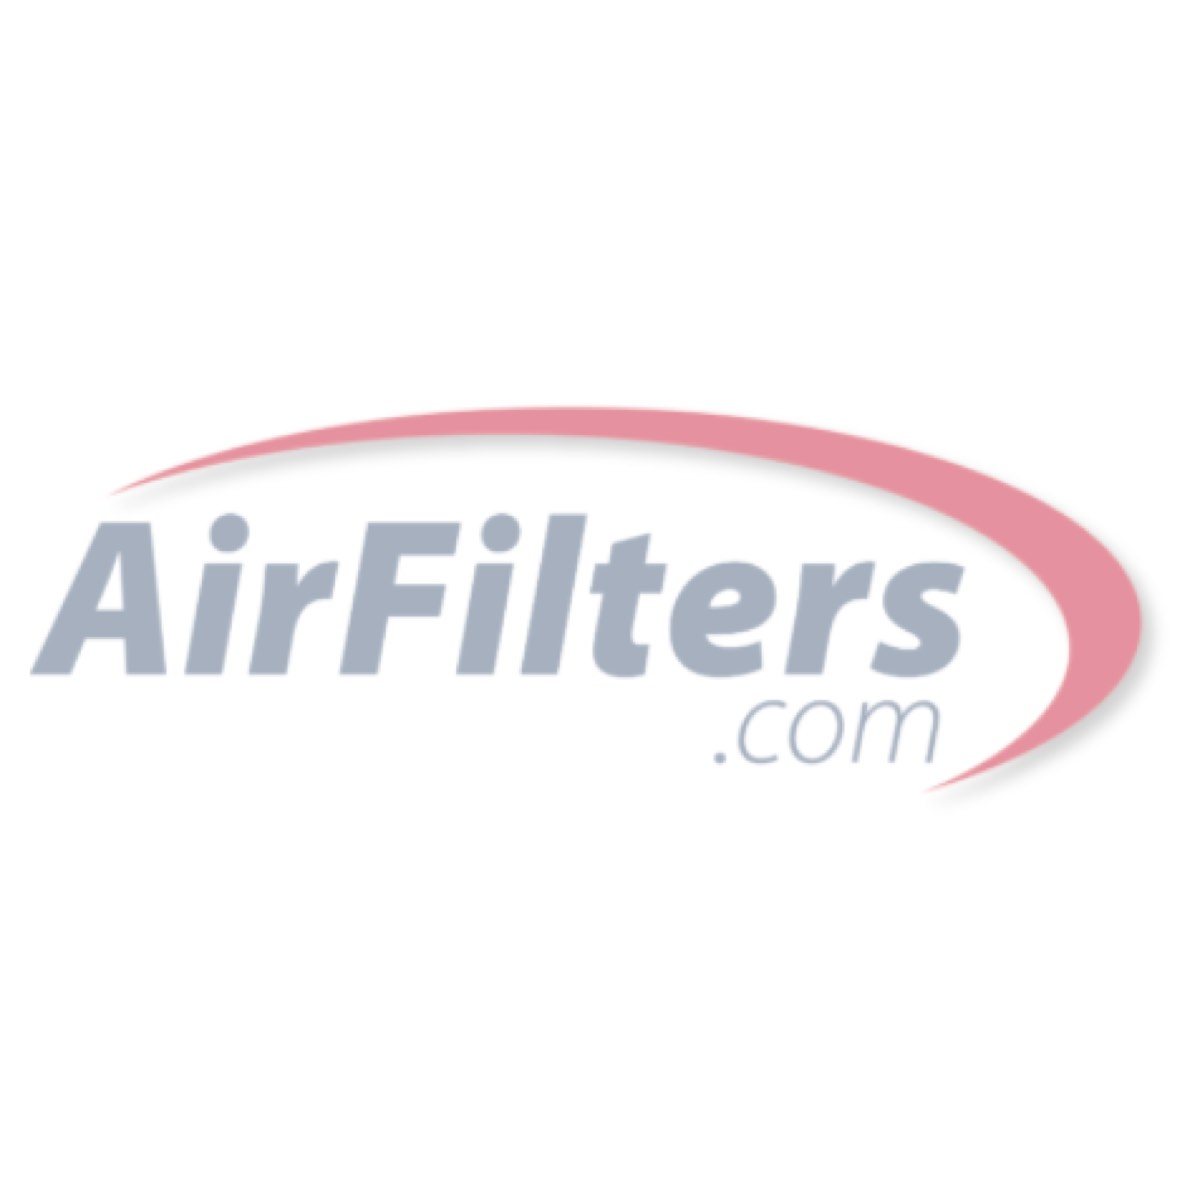 20x20x2 Bryant® Carbon VOC Replacement Filter